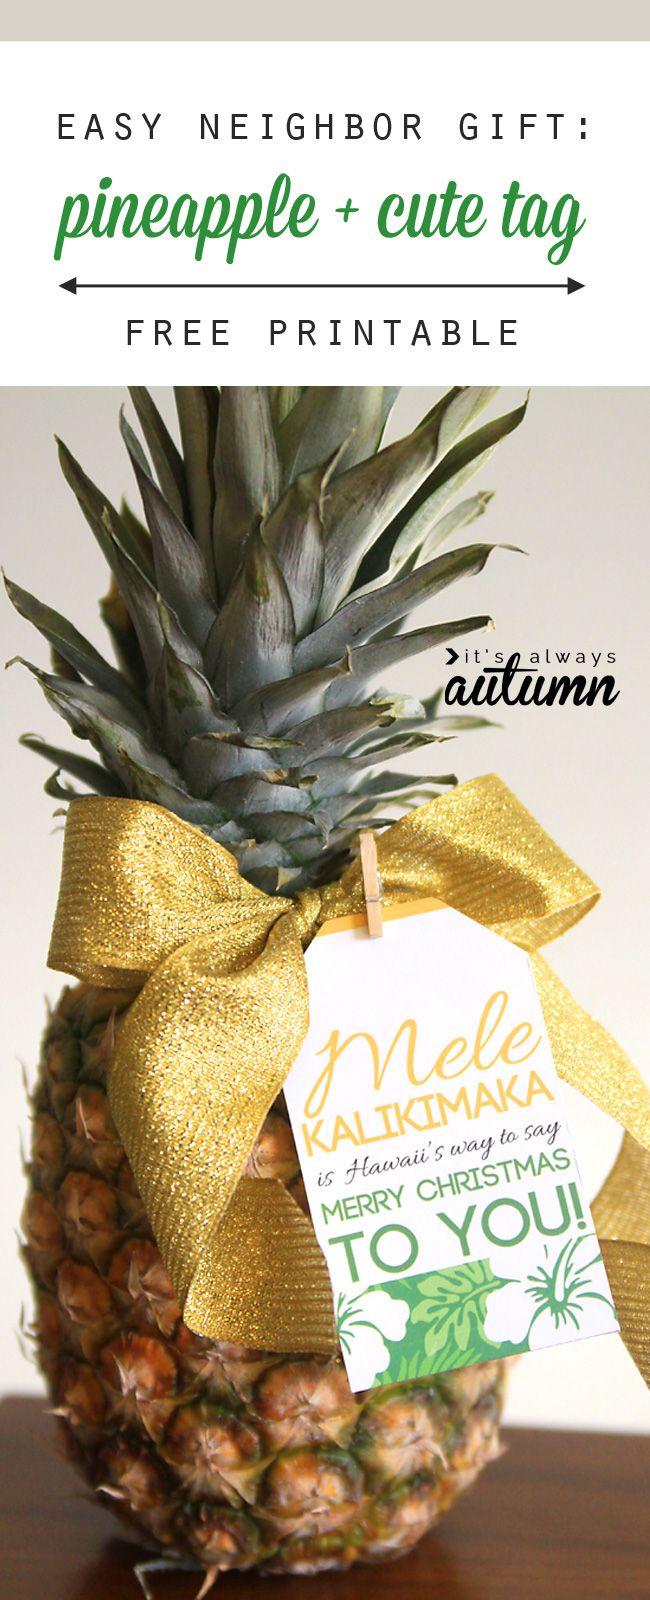 easy neighbor gift idea: pineapple + cute tag